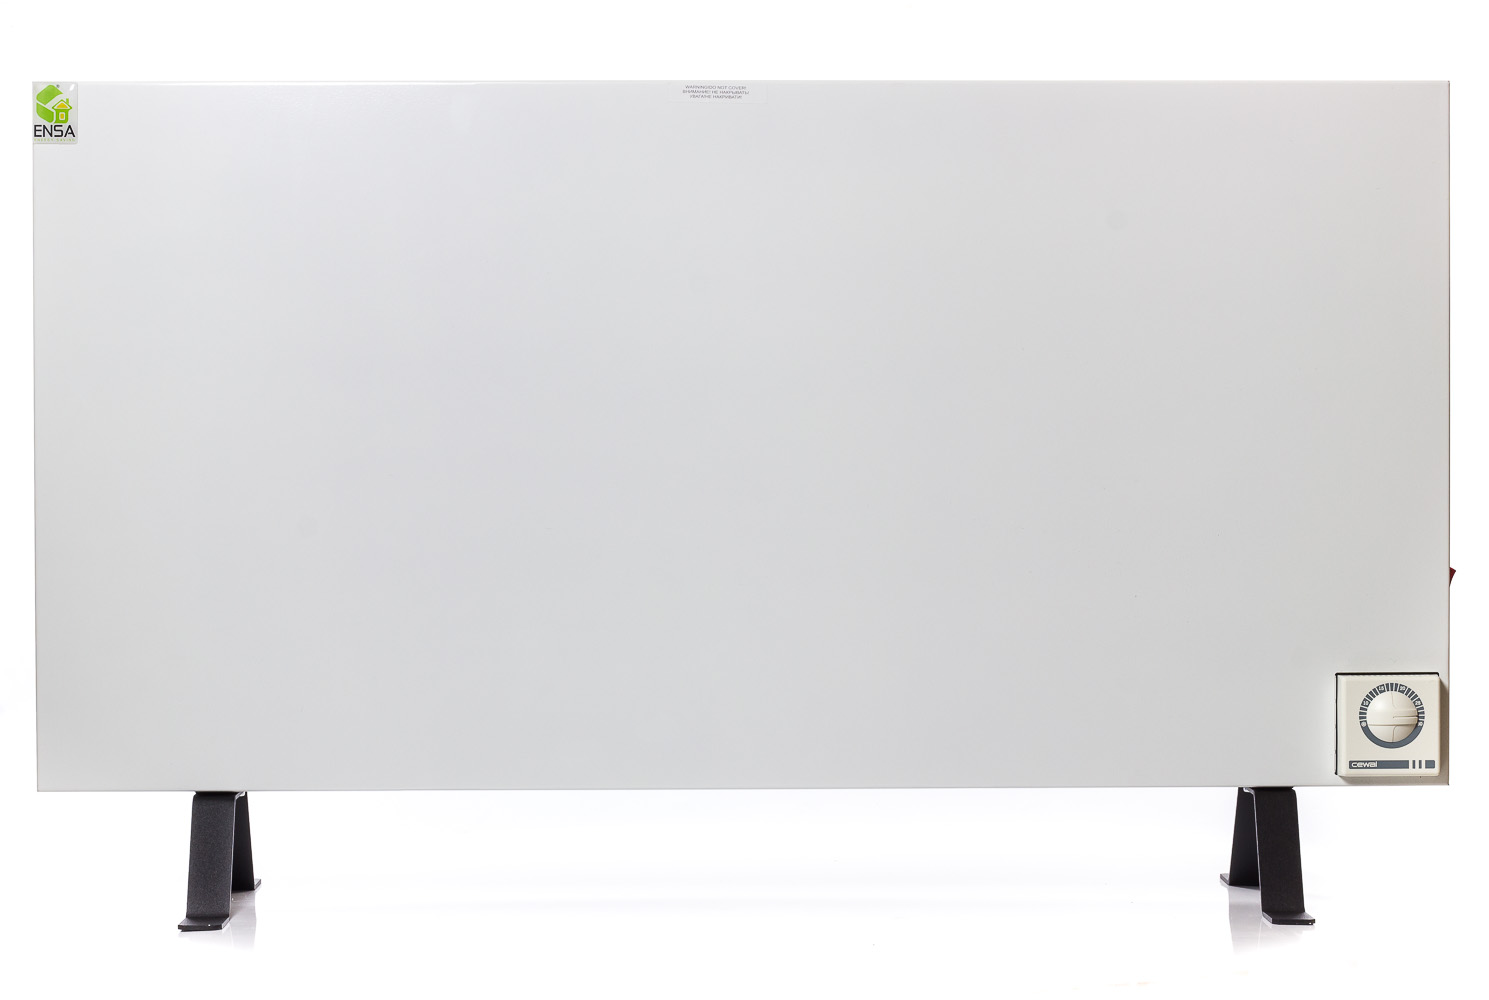 ENSA C750